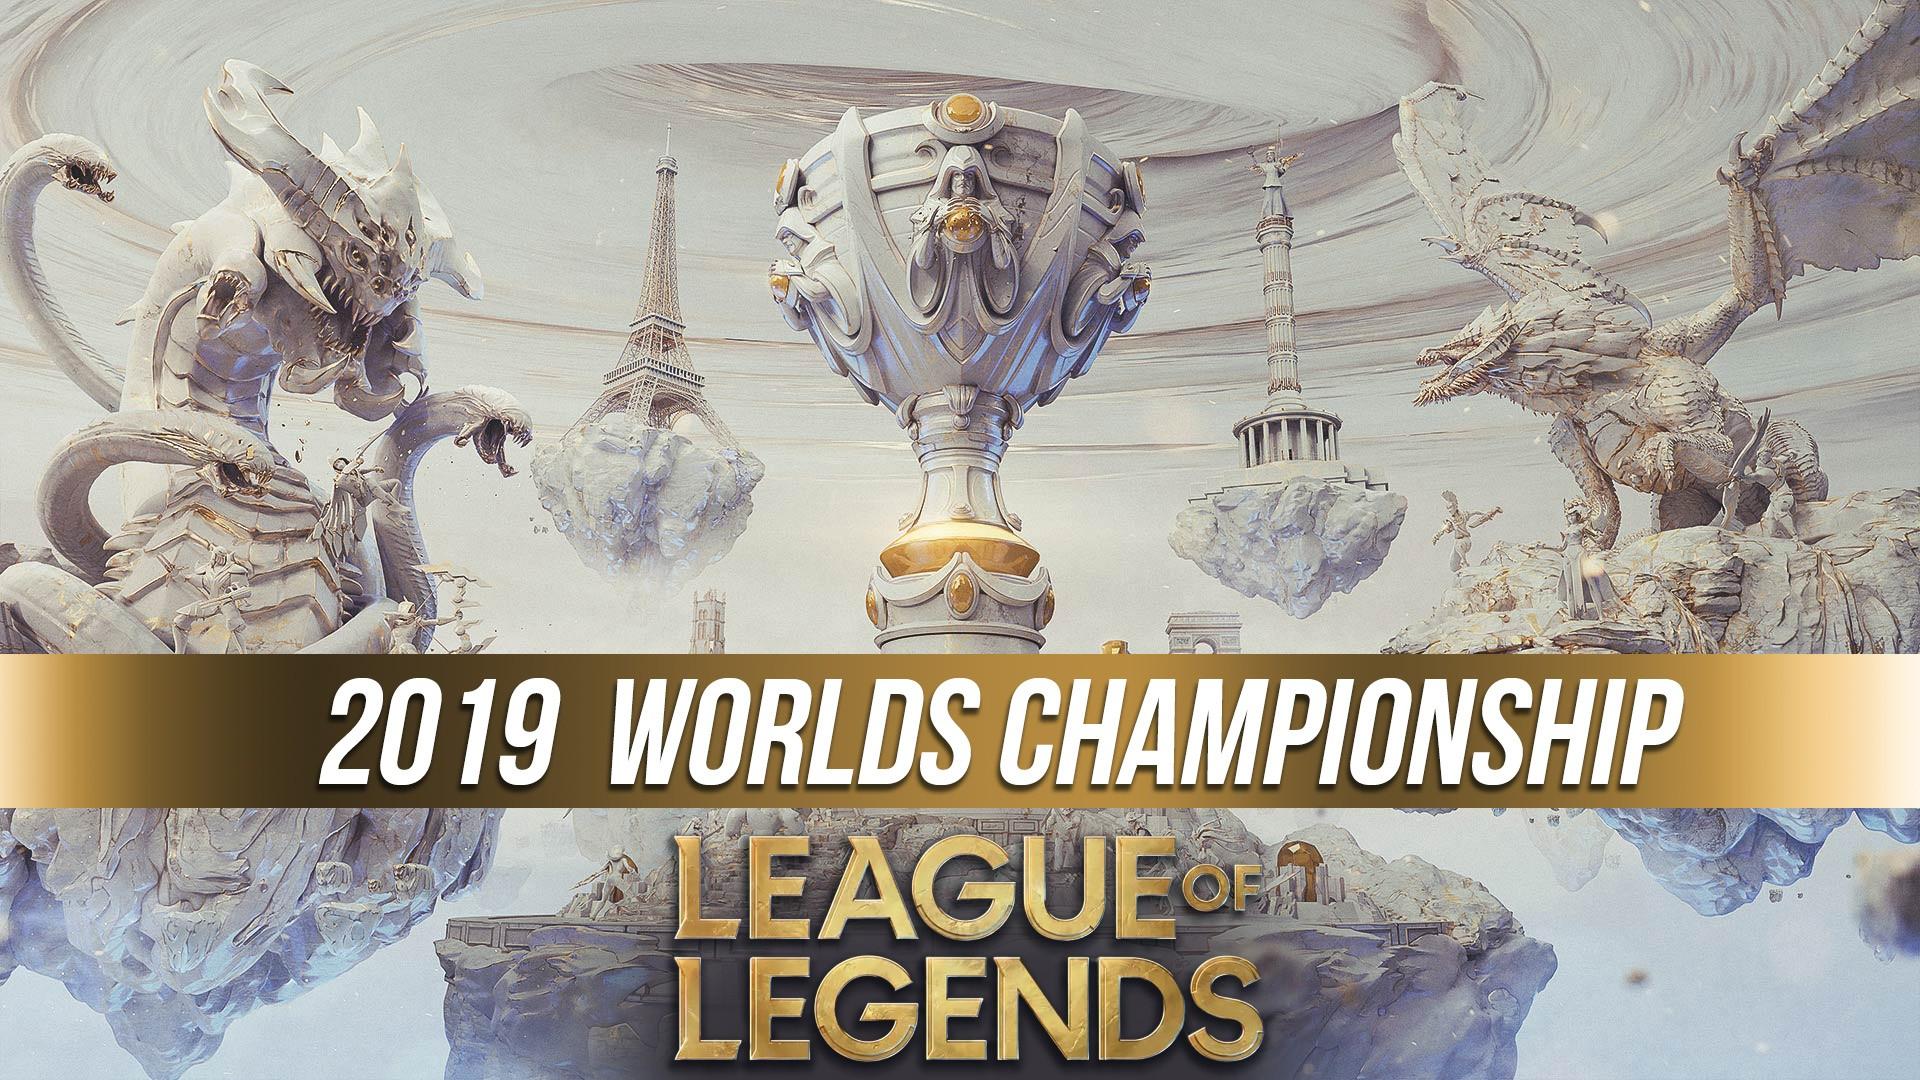 League of Legends World Championship 2019